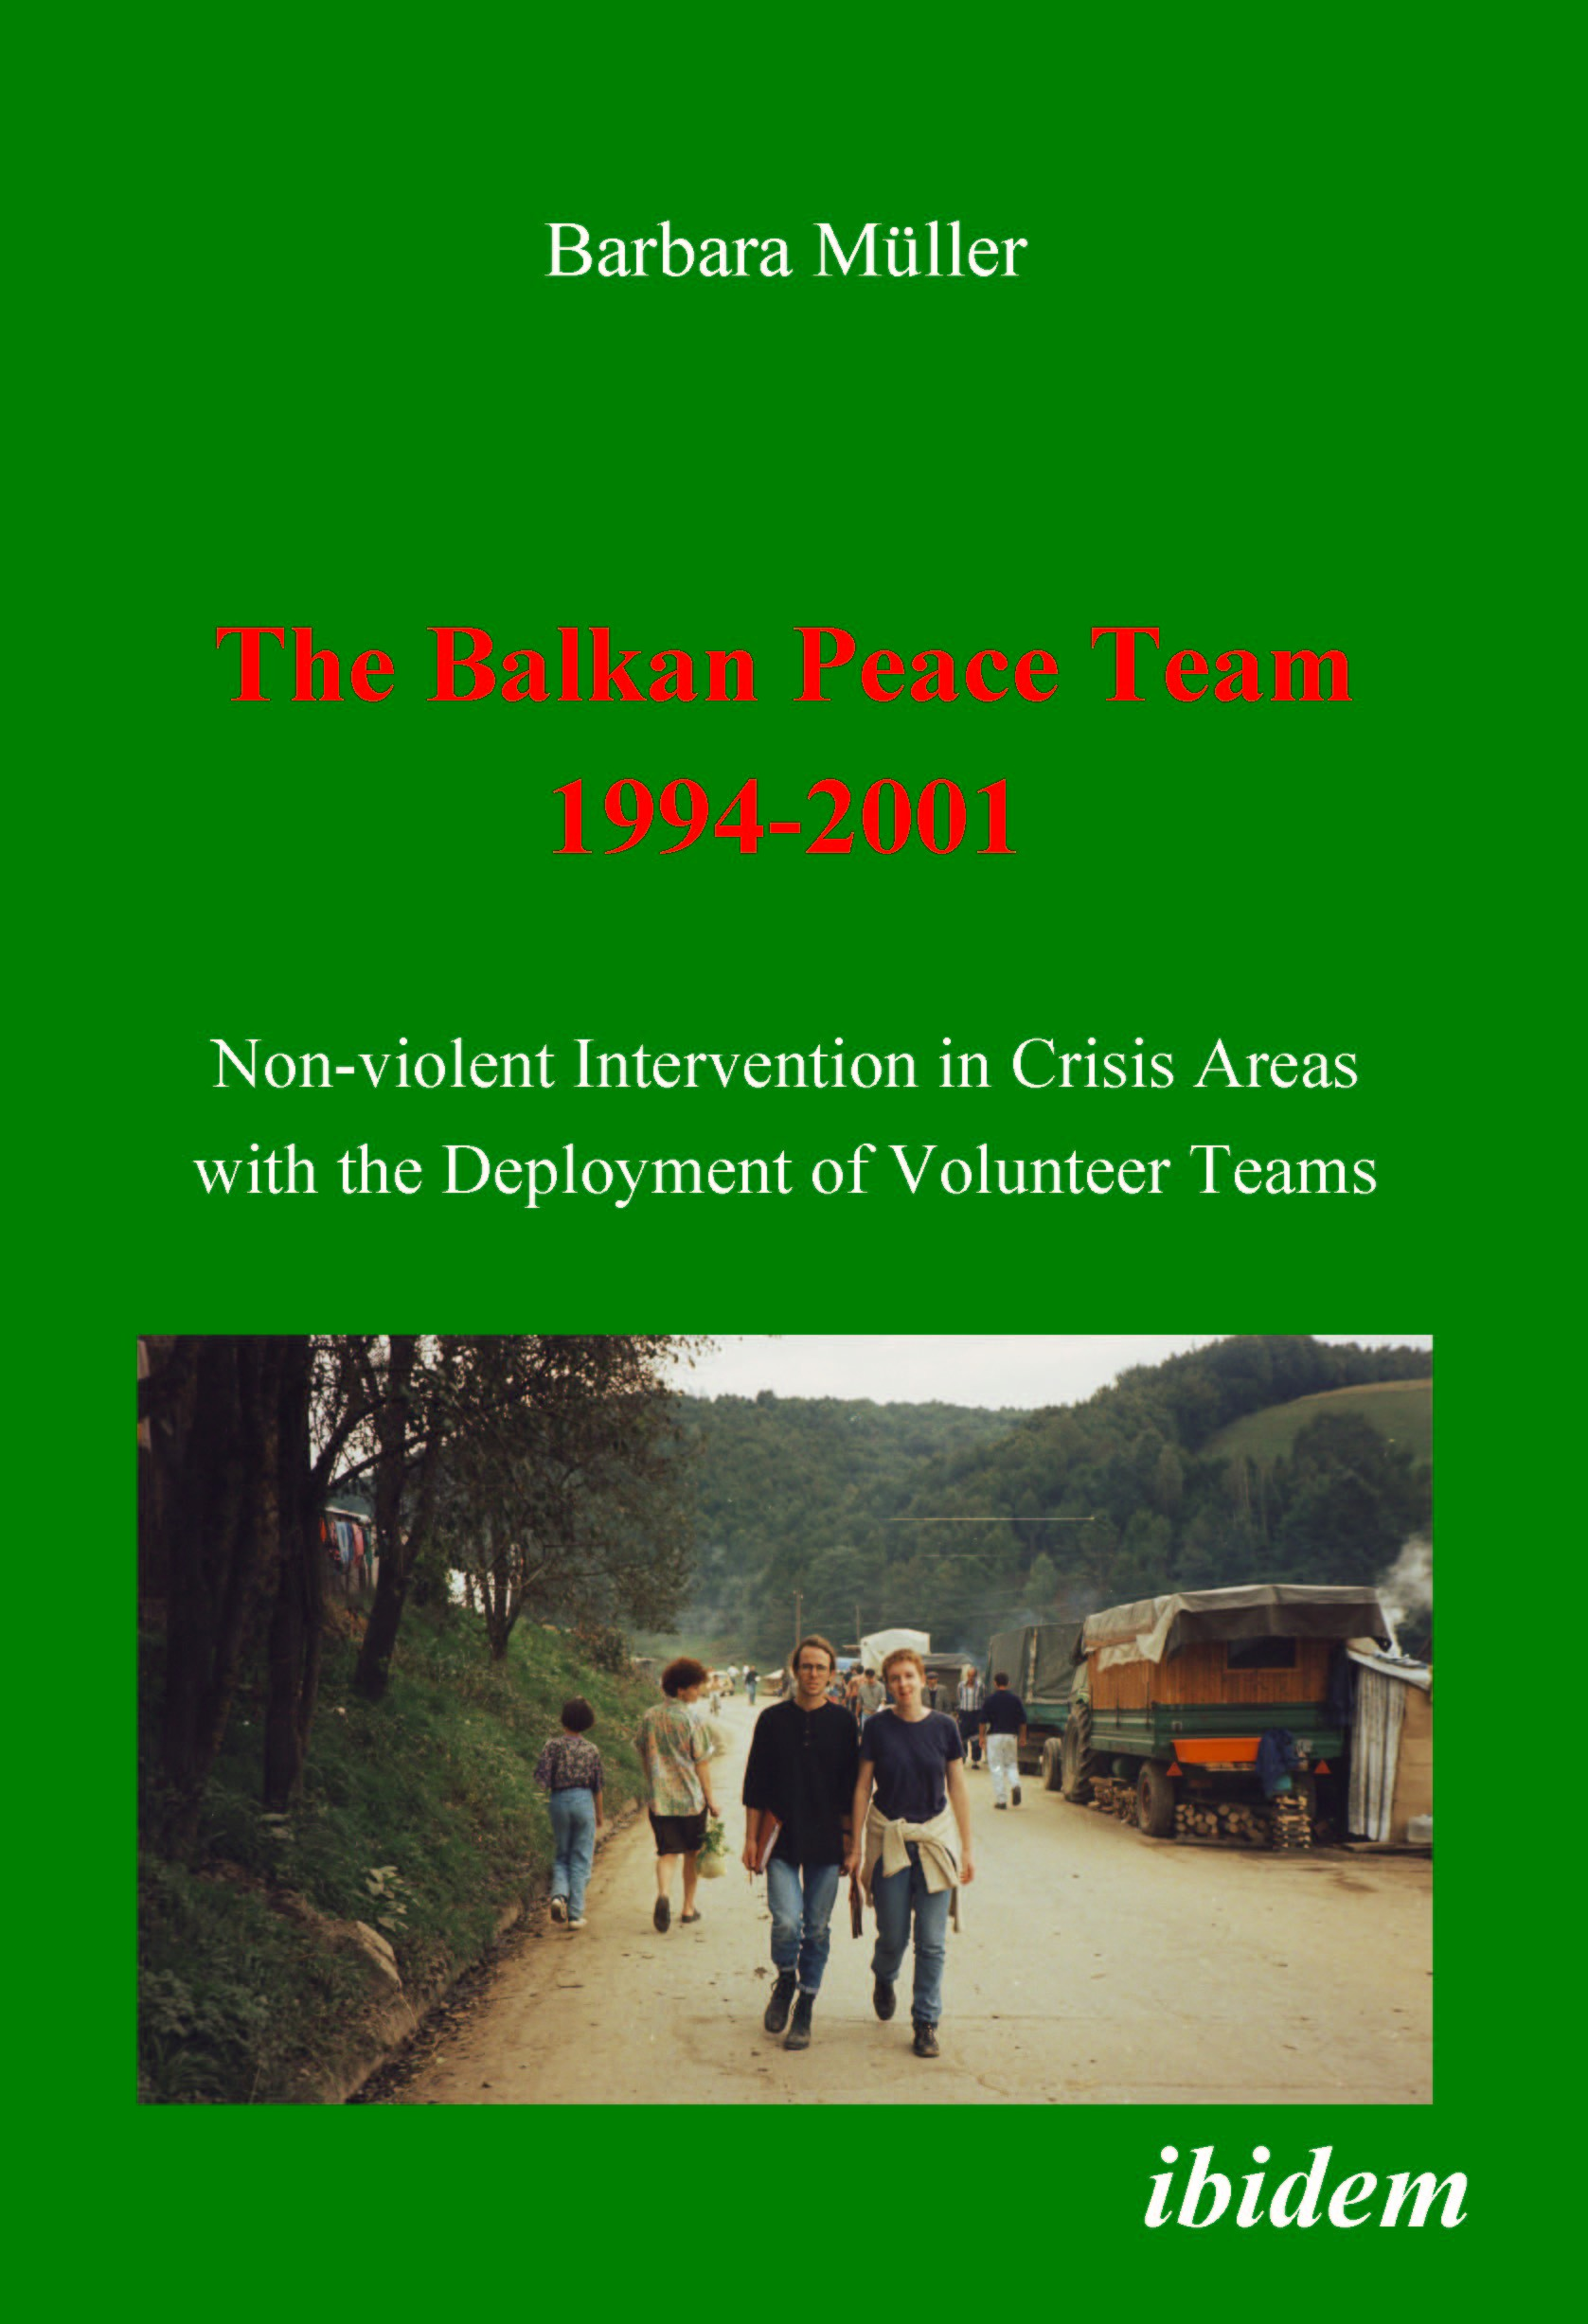 The Balkan Peace Team 1994-2001